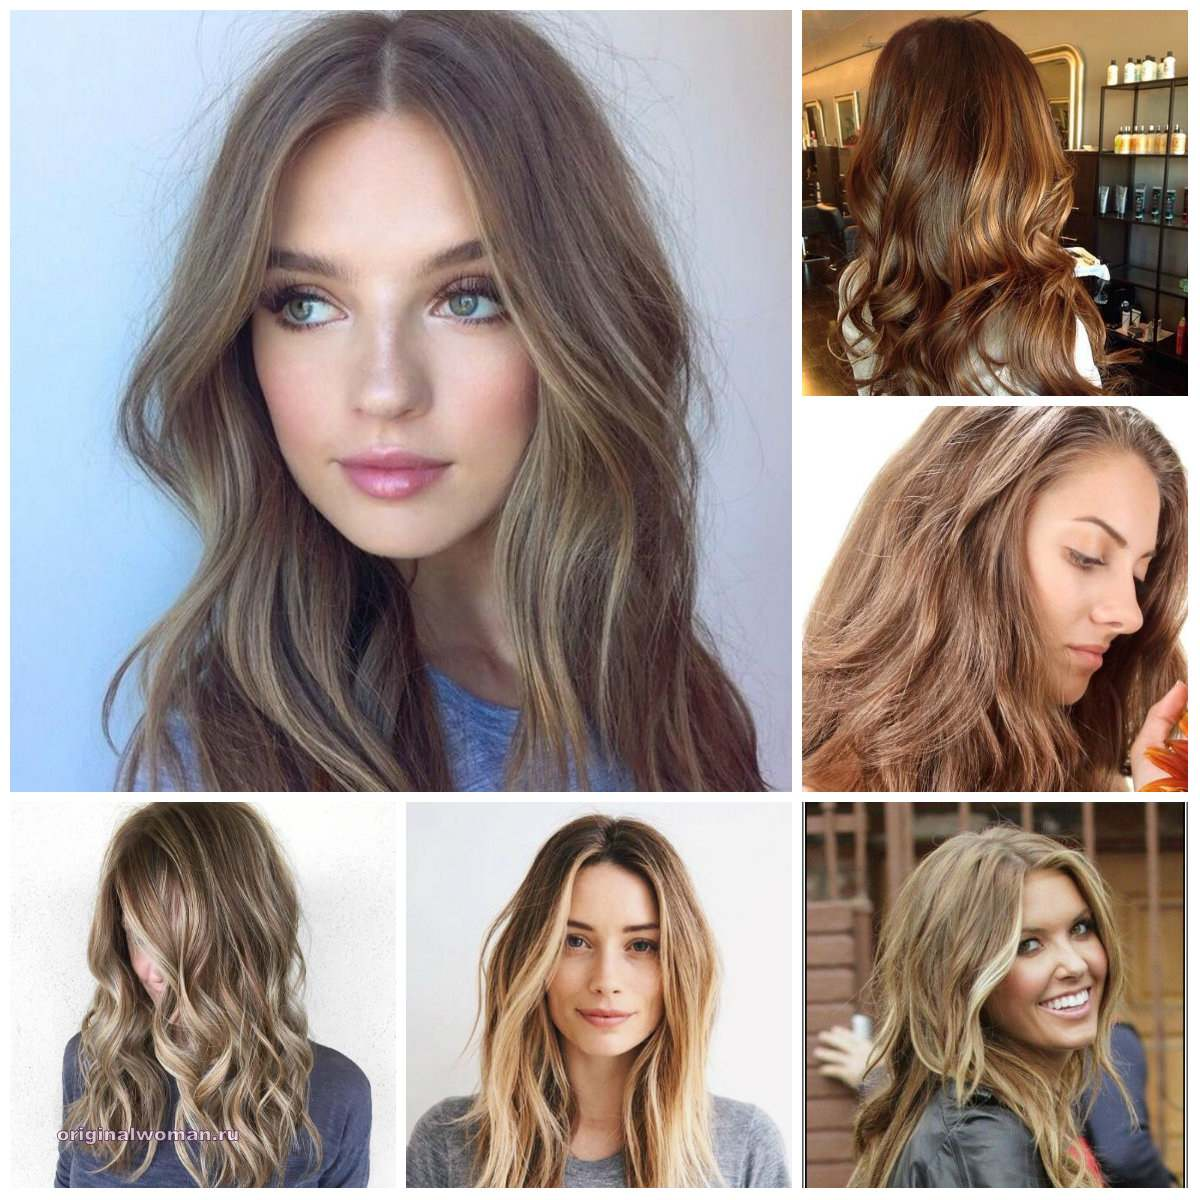 Окрашивание волос 2018 57 фото новинки и модные тенденции